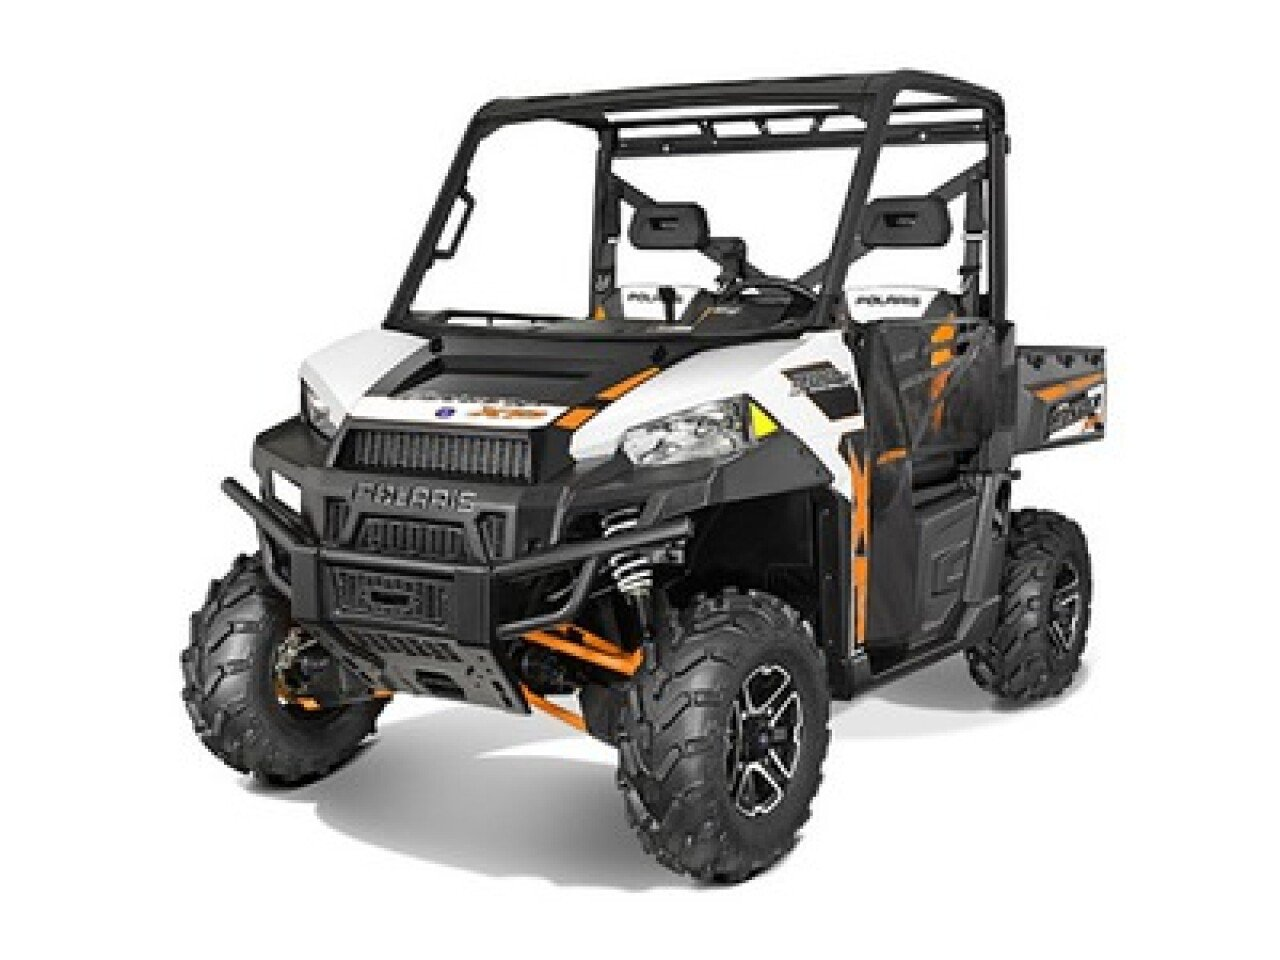 2015 polaris ranger xp 900 for sale near wesley chapel florida 33543 motorcycles on autotrader